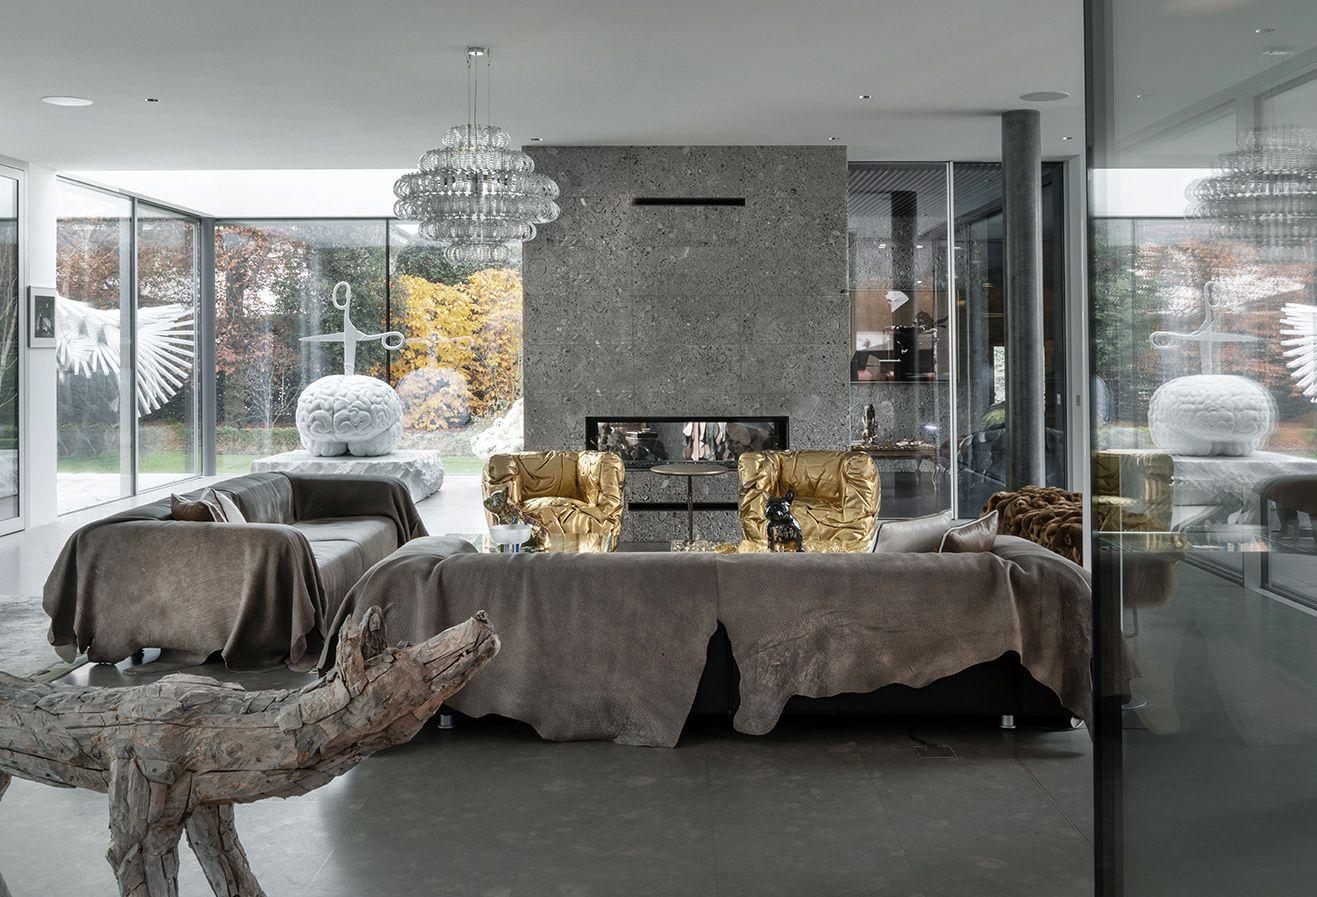 Villa in Svizzera - image 42